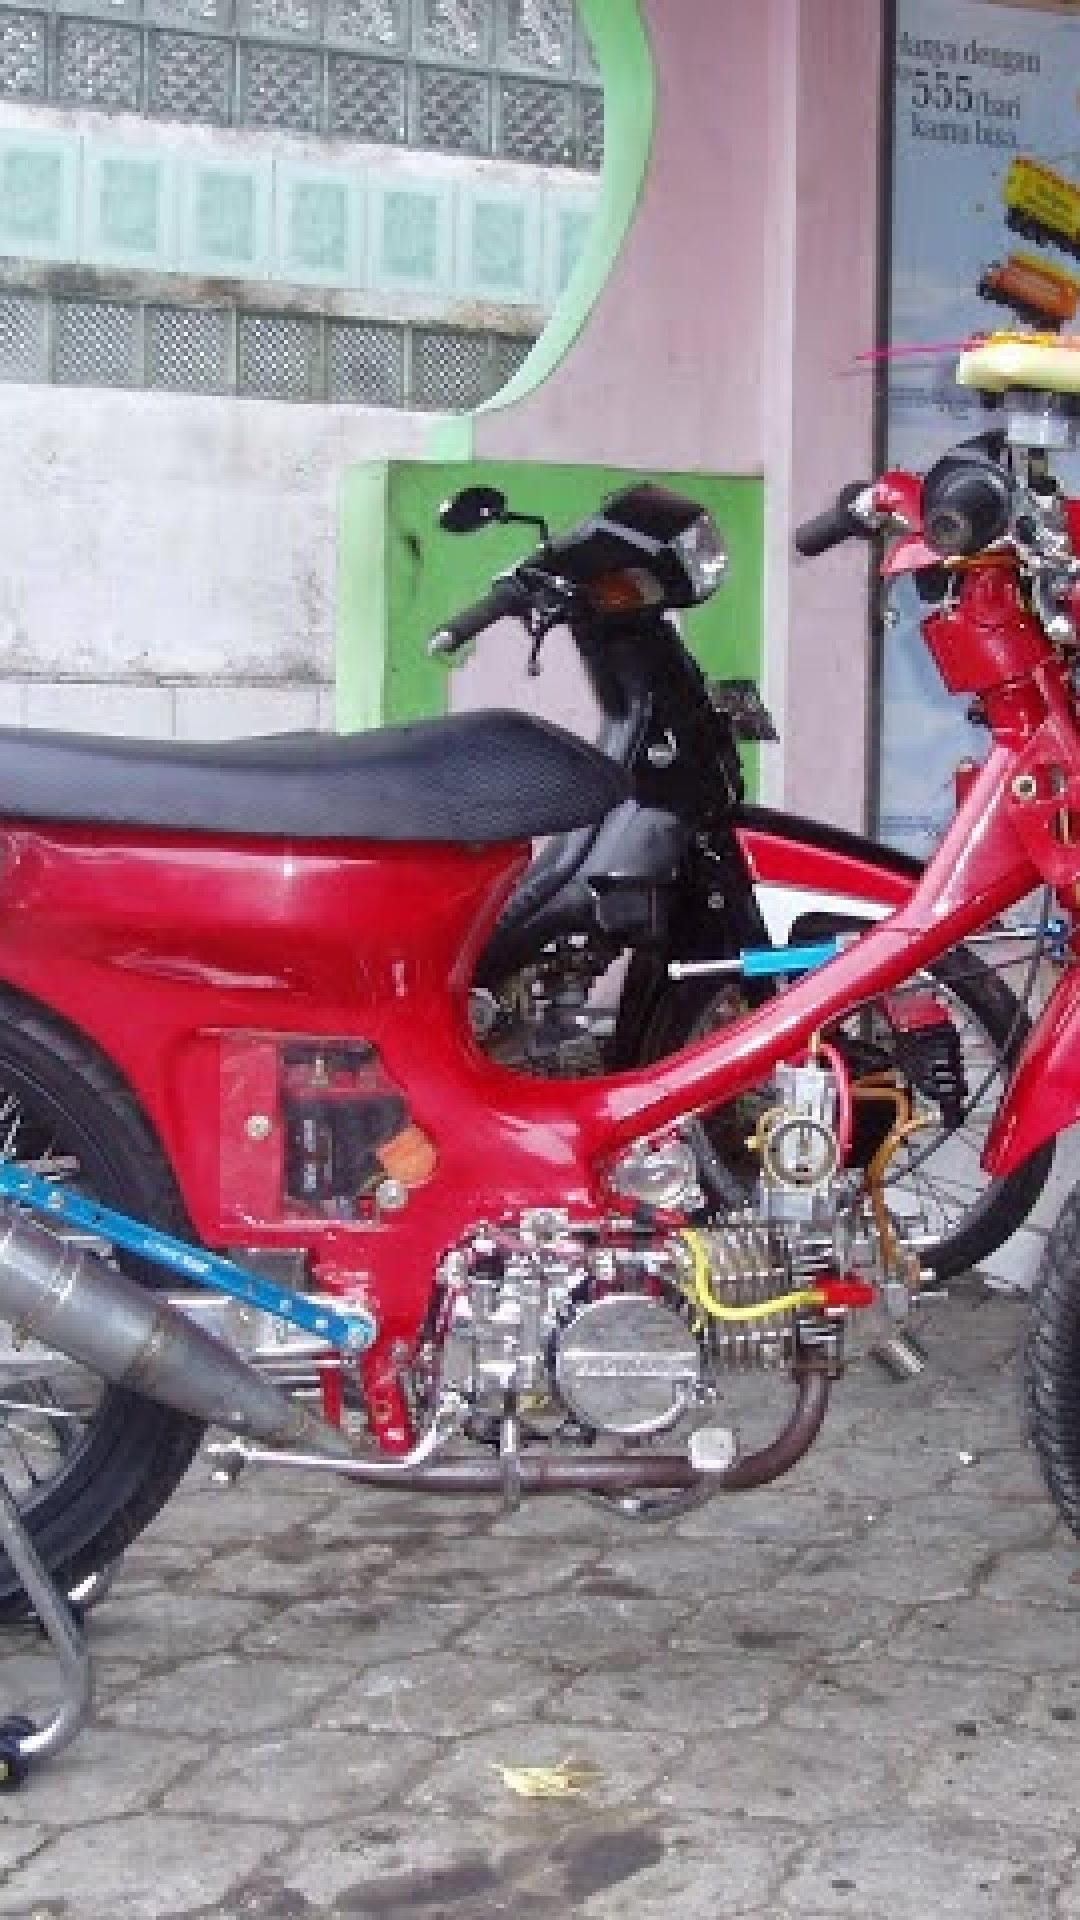 Ide 64 Modifikasi Motor Honda Grand Impressa Terbaru Cermin Modifikasi